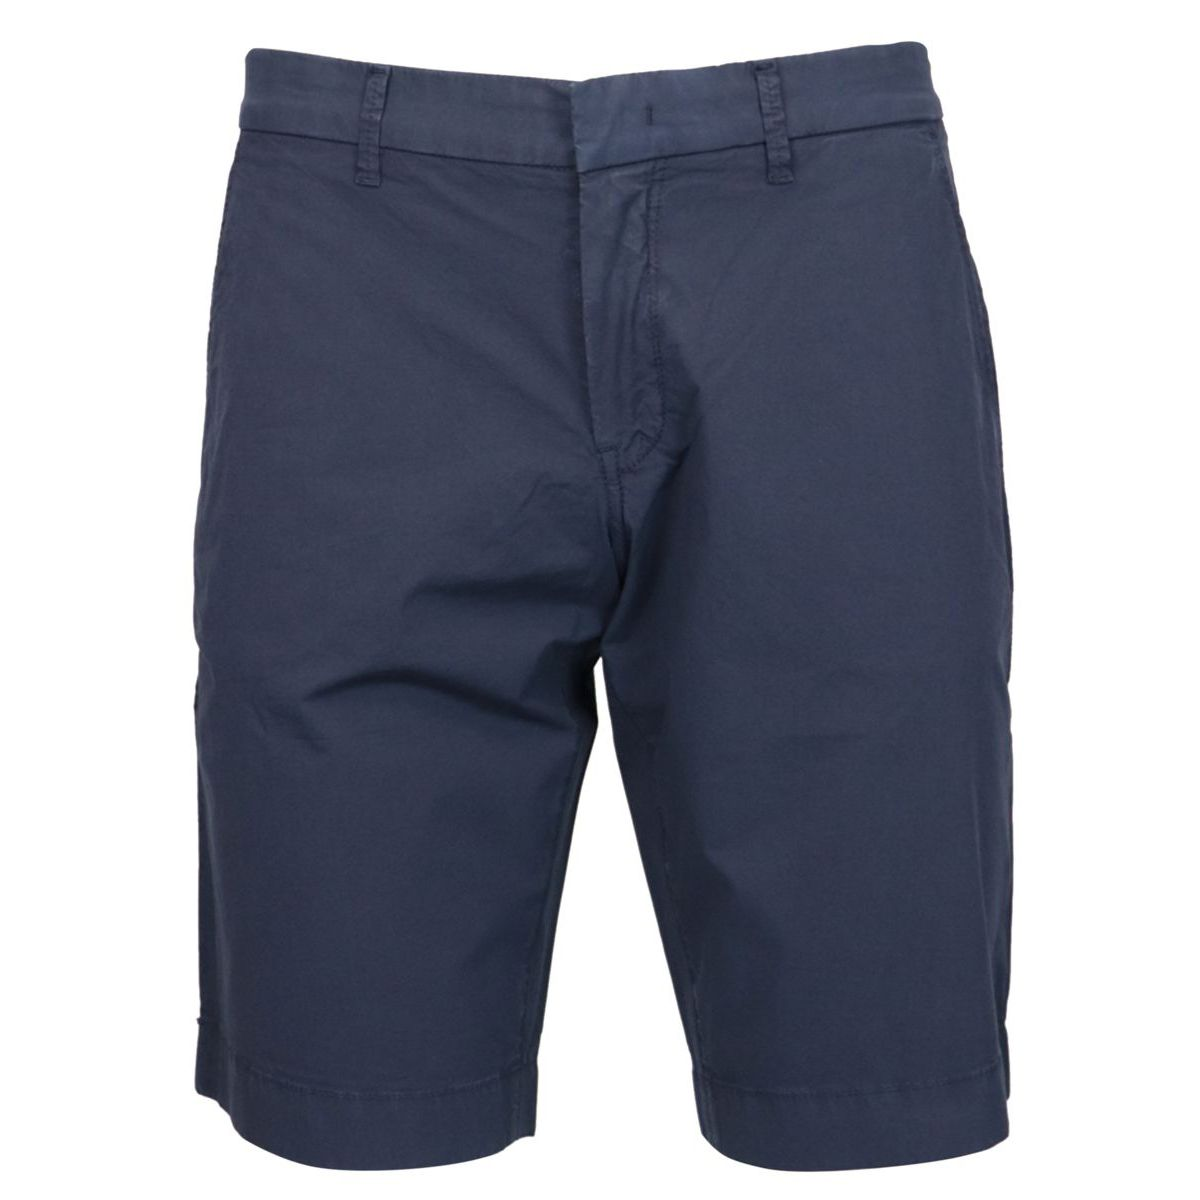 Garment-dyed cotton CHINO shorts Navy Fay